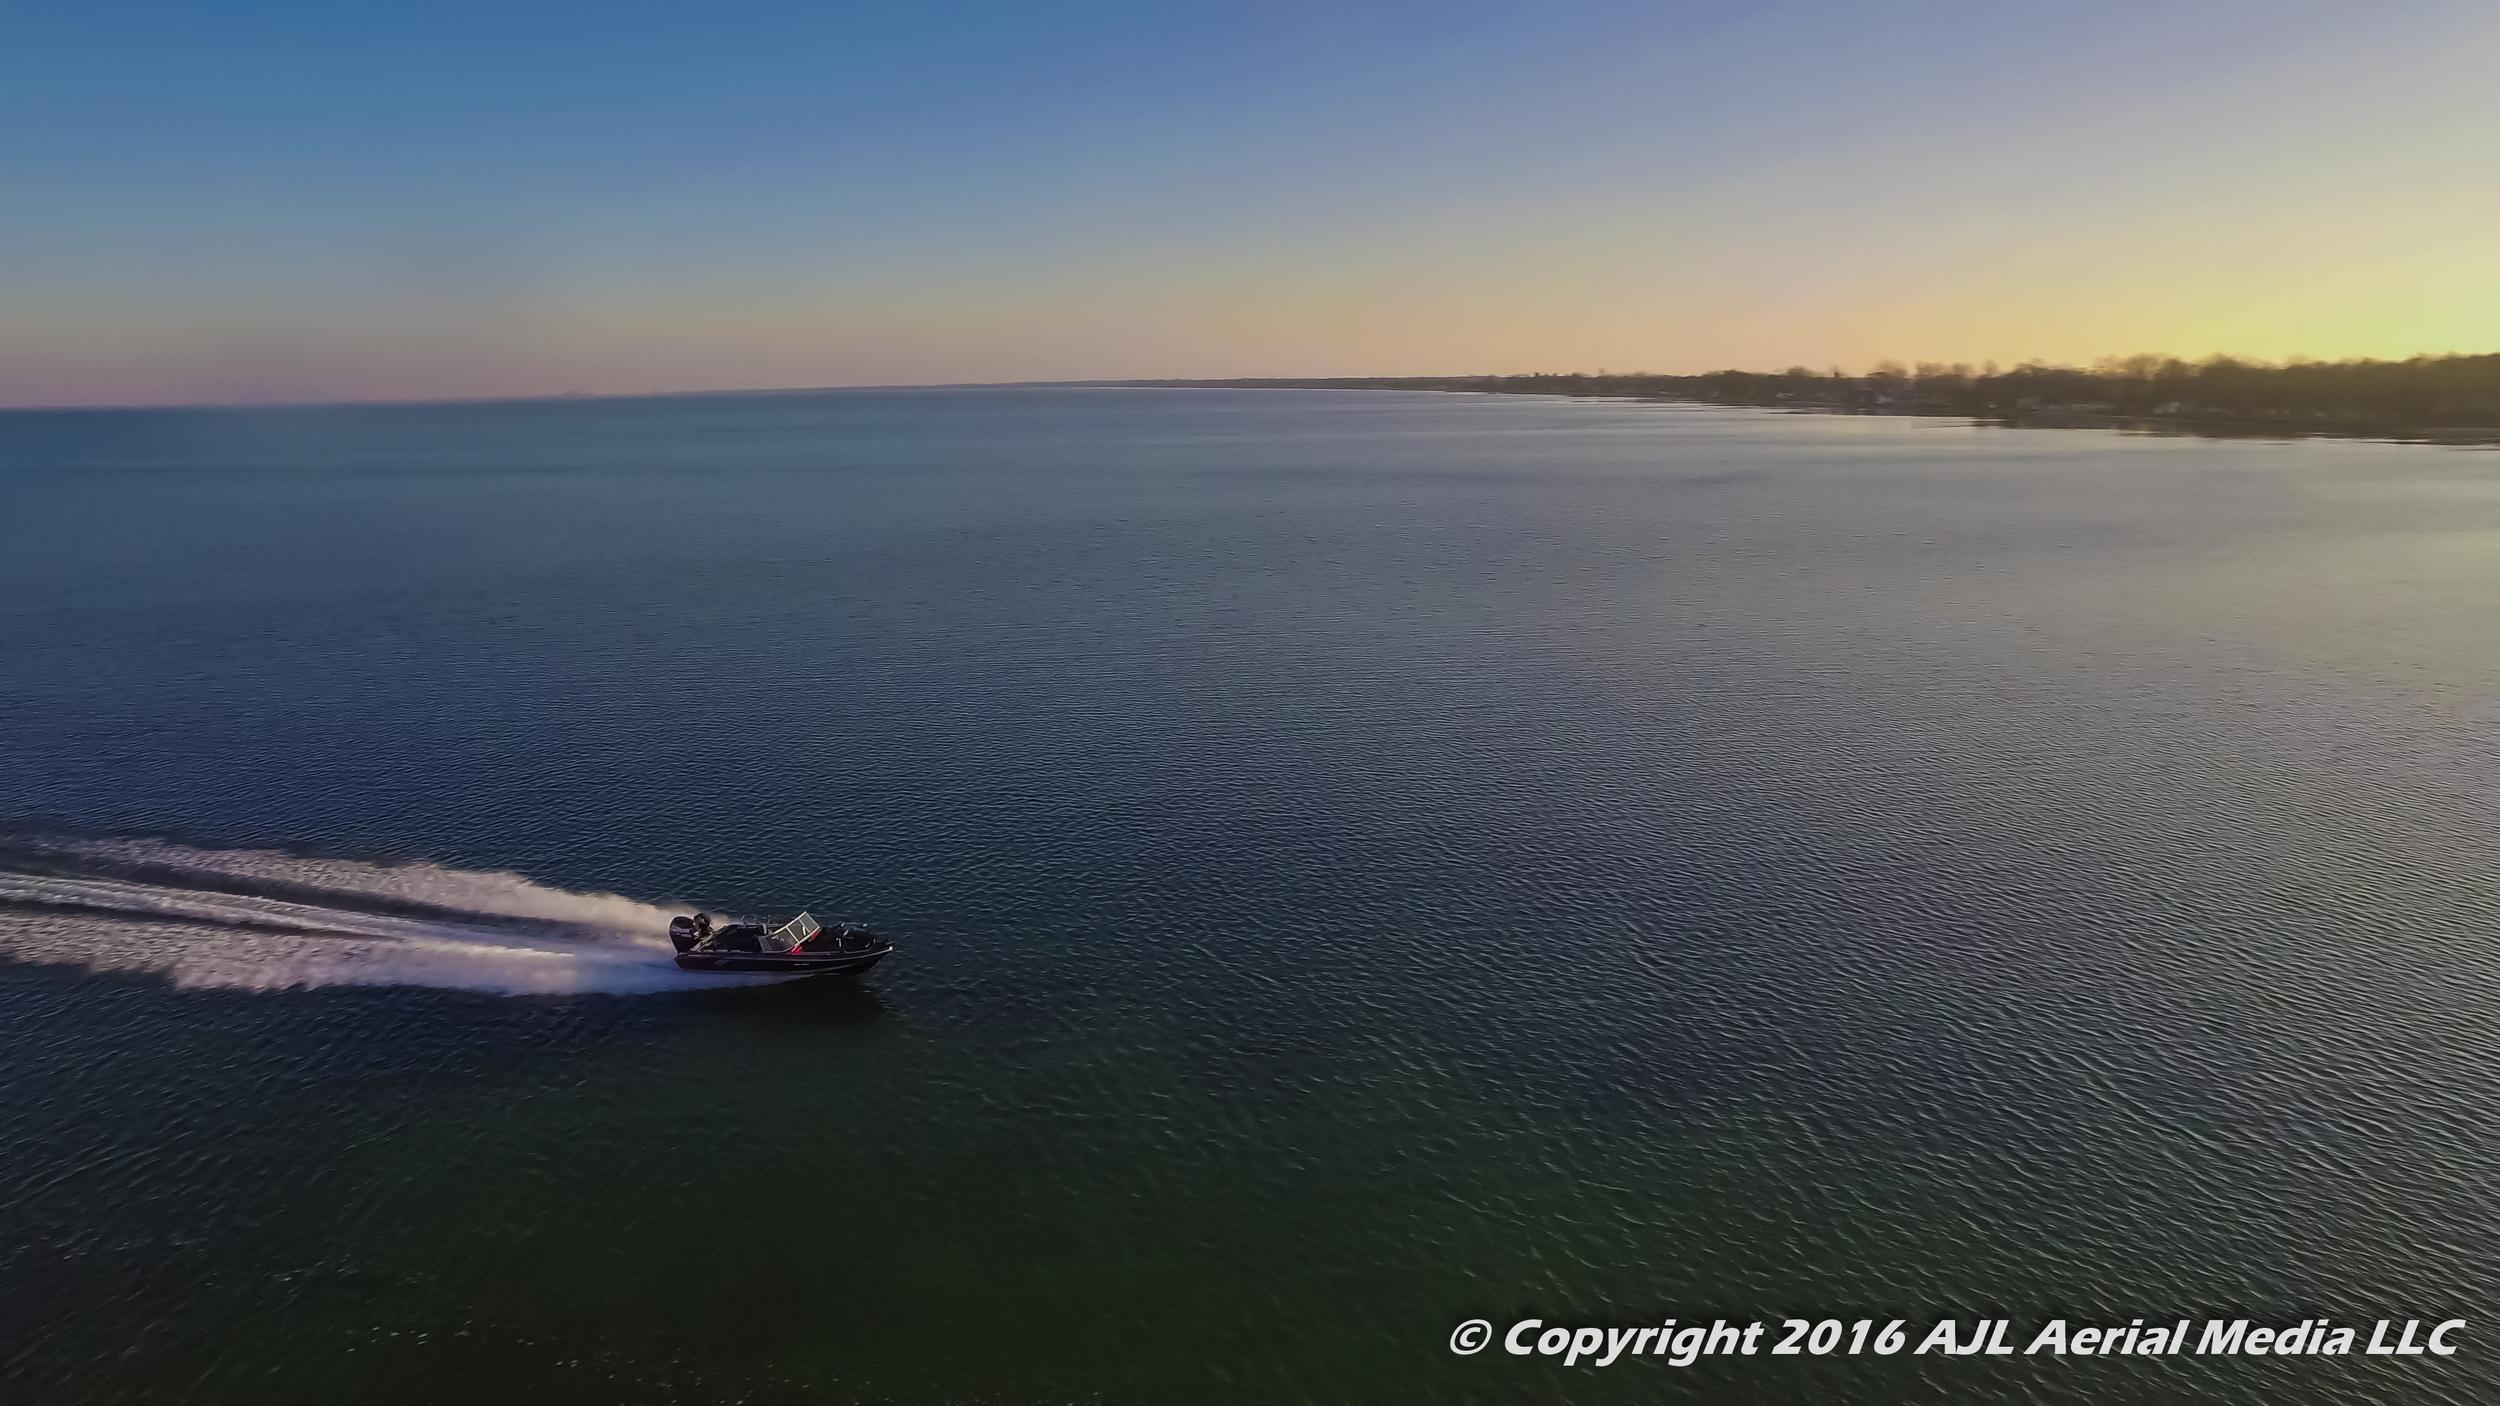 Saginaw Bay Boat Ride Aerial